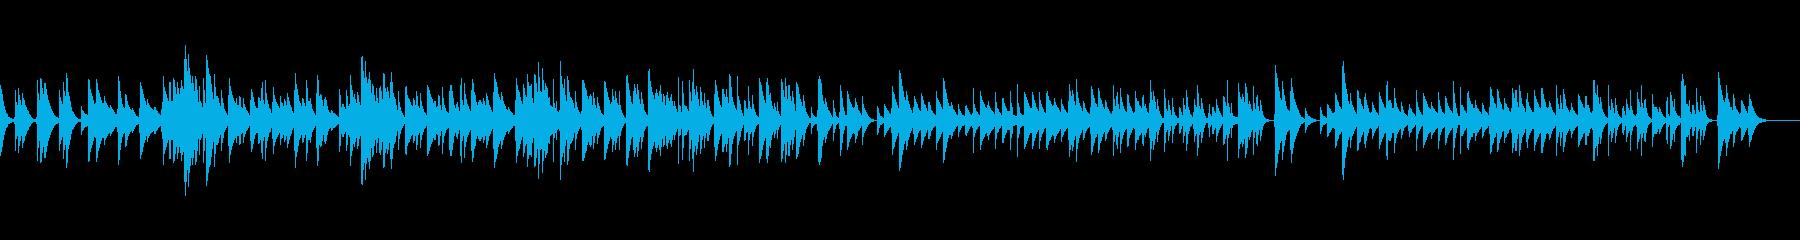 J.シュトラウスⅡ「春の声」オルゴールの再生済みの波形